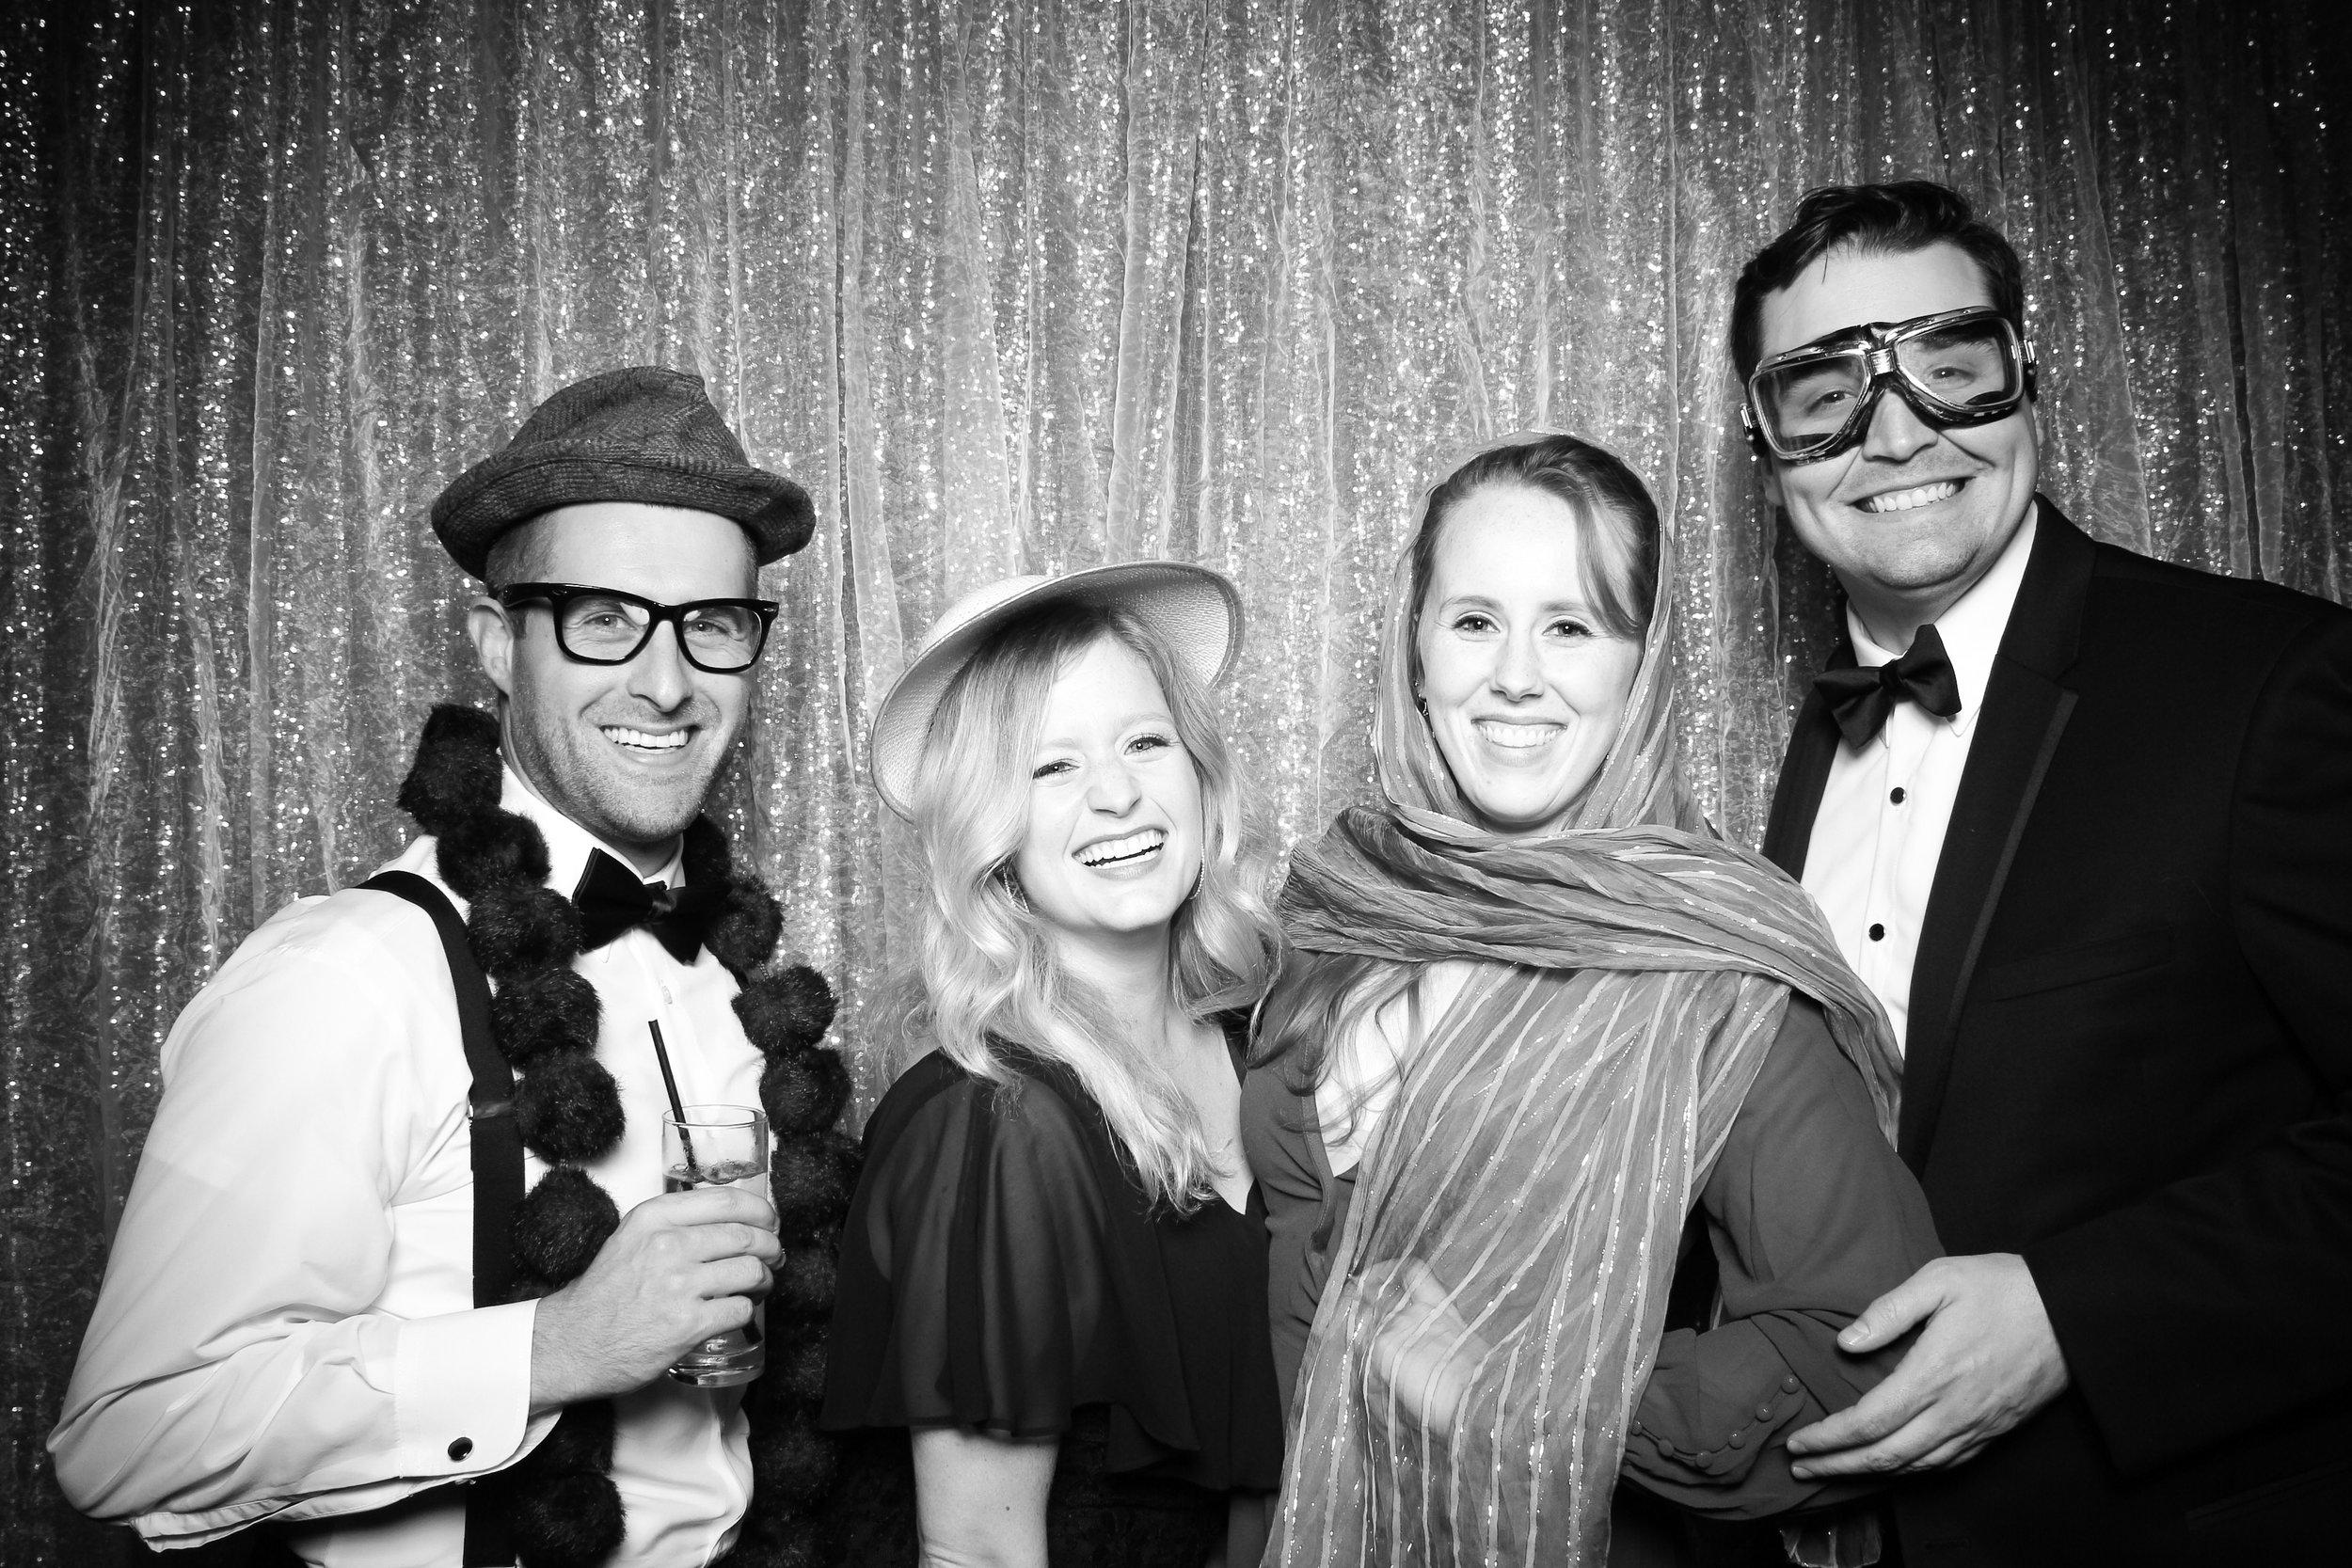 JW_Marriott_Burnham_Ballroom_Wedding_Photo_Booth_13.jpg